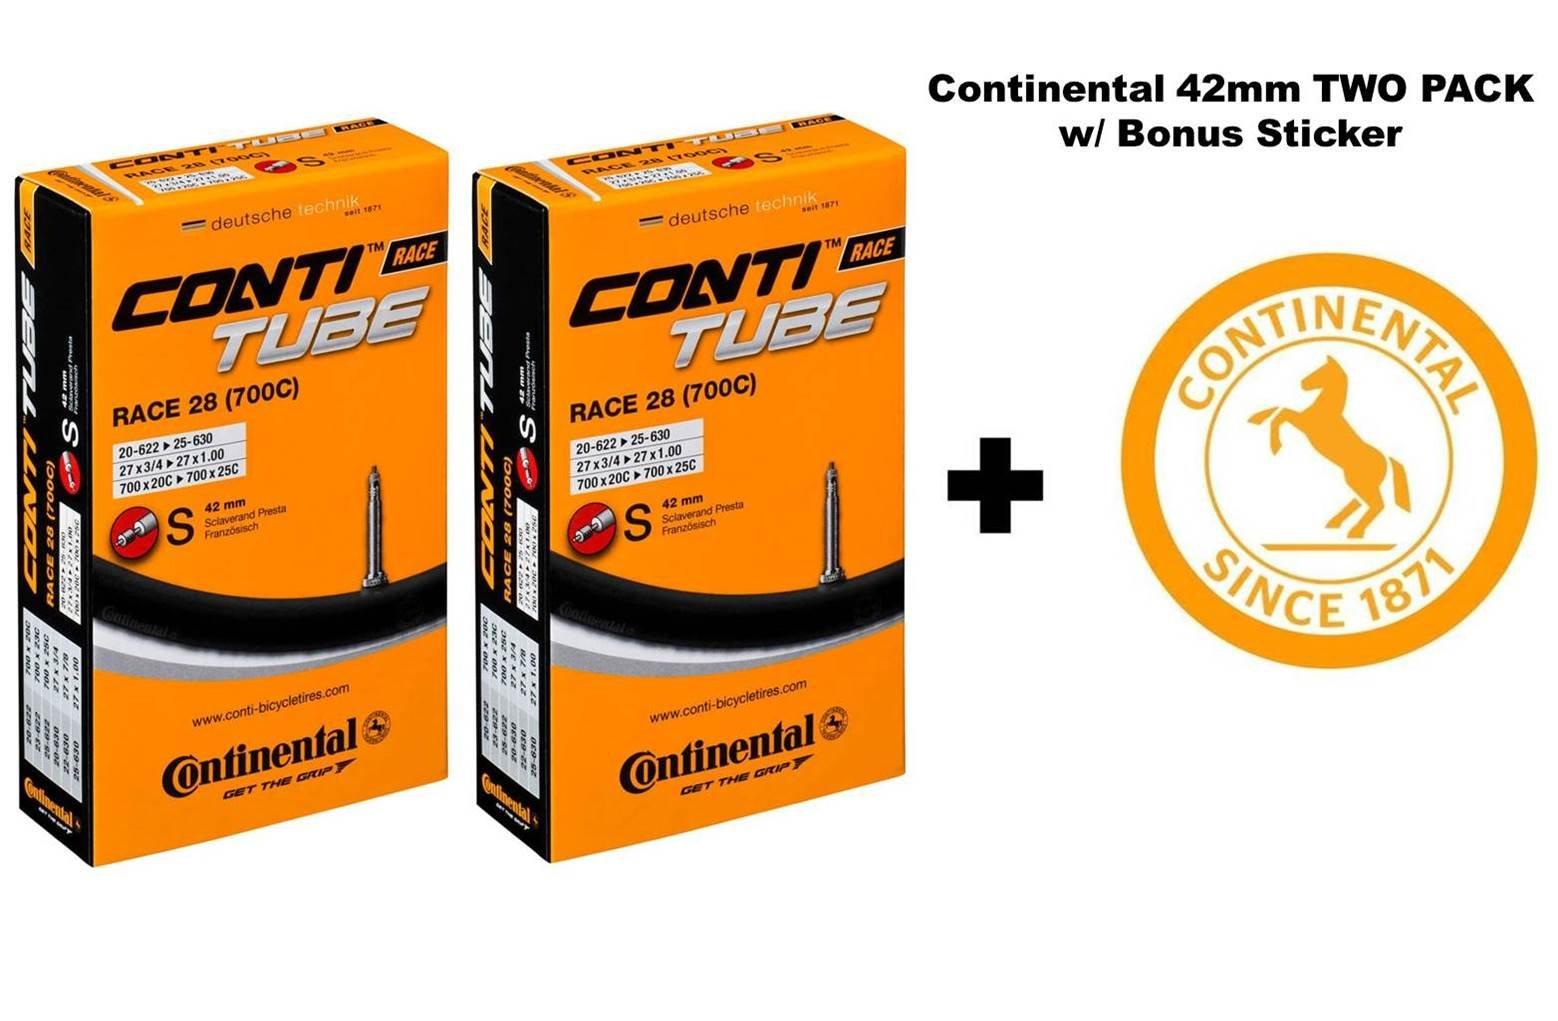 Continental Race 28'' 700x20-25c Bicycle Inner Tubes - 42mm Long Presta Valve - TWO PACK w/BONUS Conti Sticker